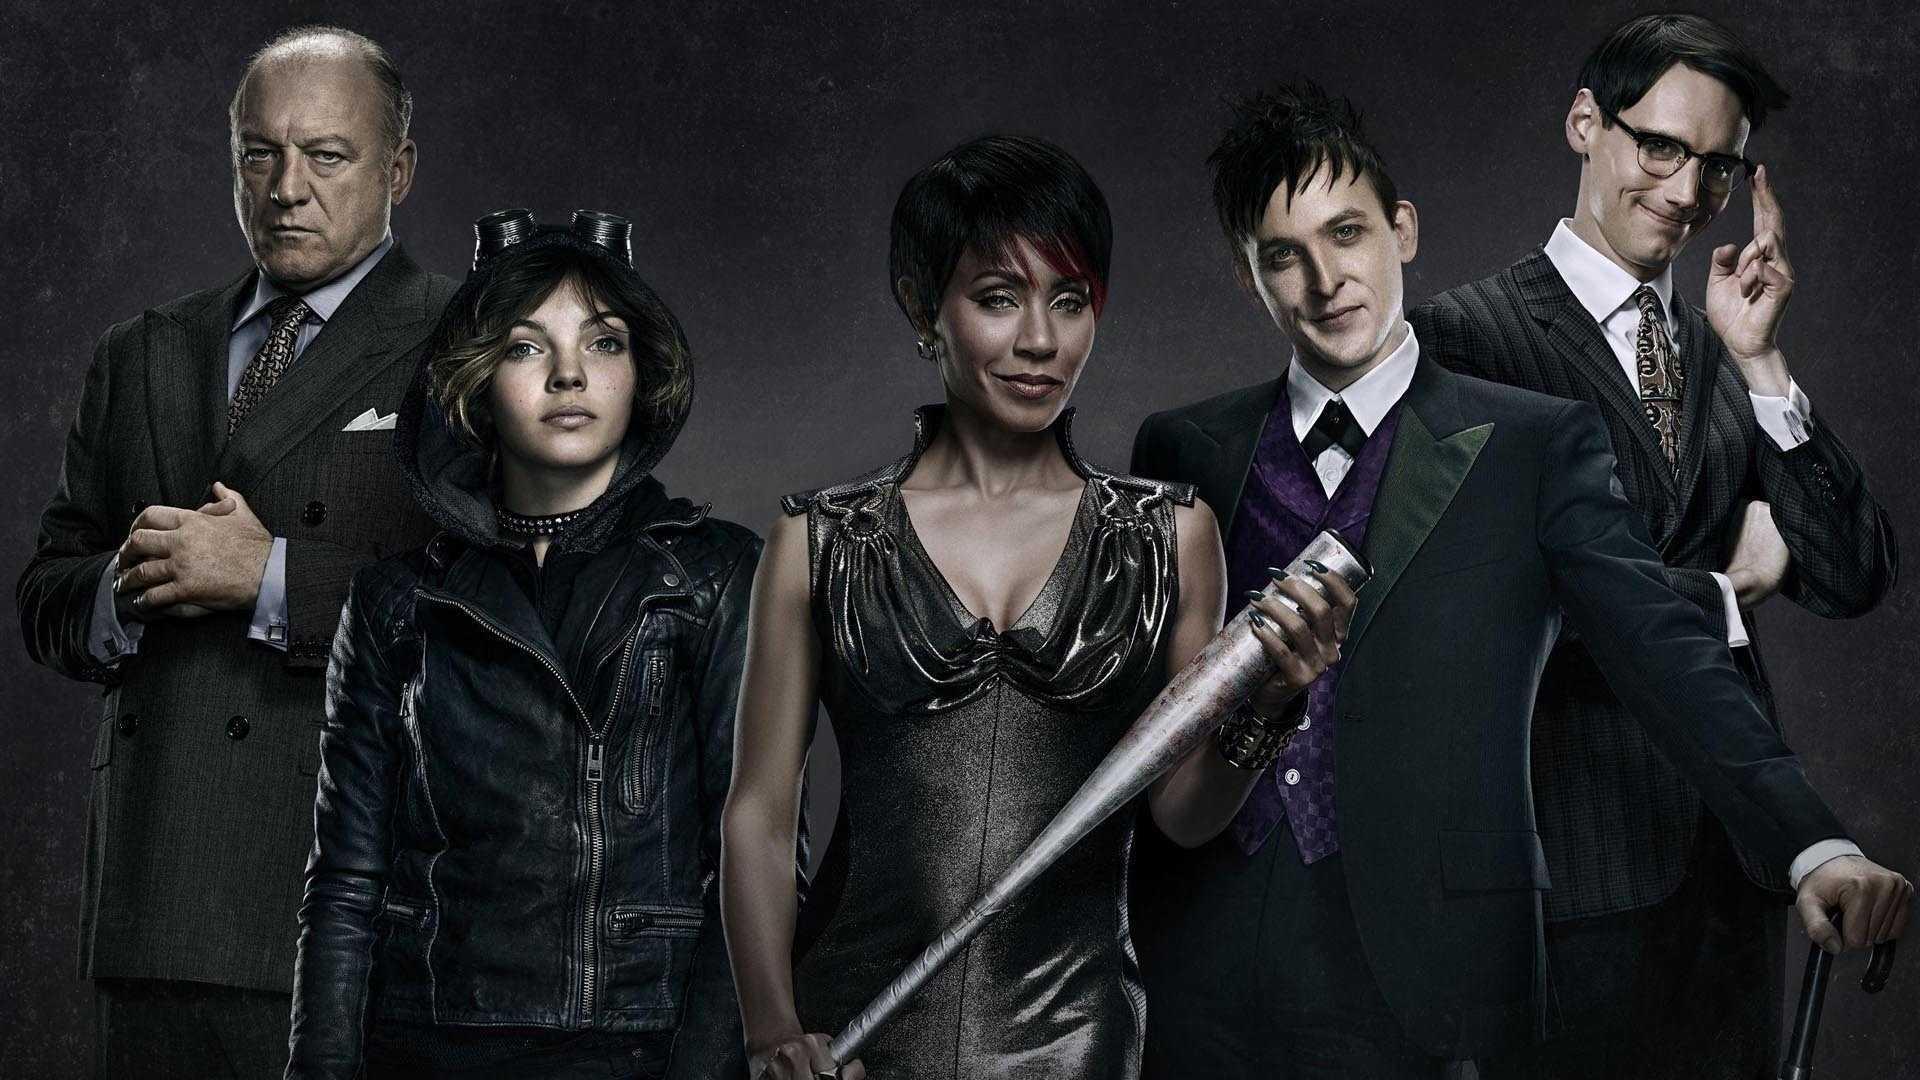 Wallpaper Gotham HD Wallpaper Tv Shows Upload at September 26 2014 1920x1080